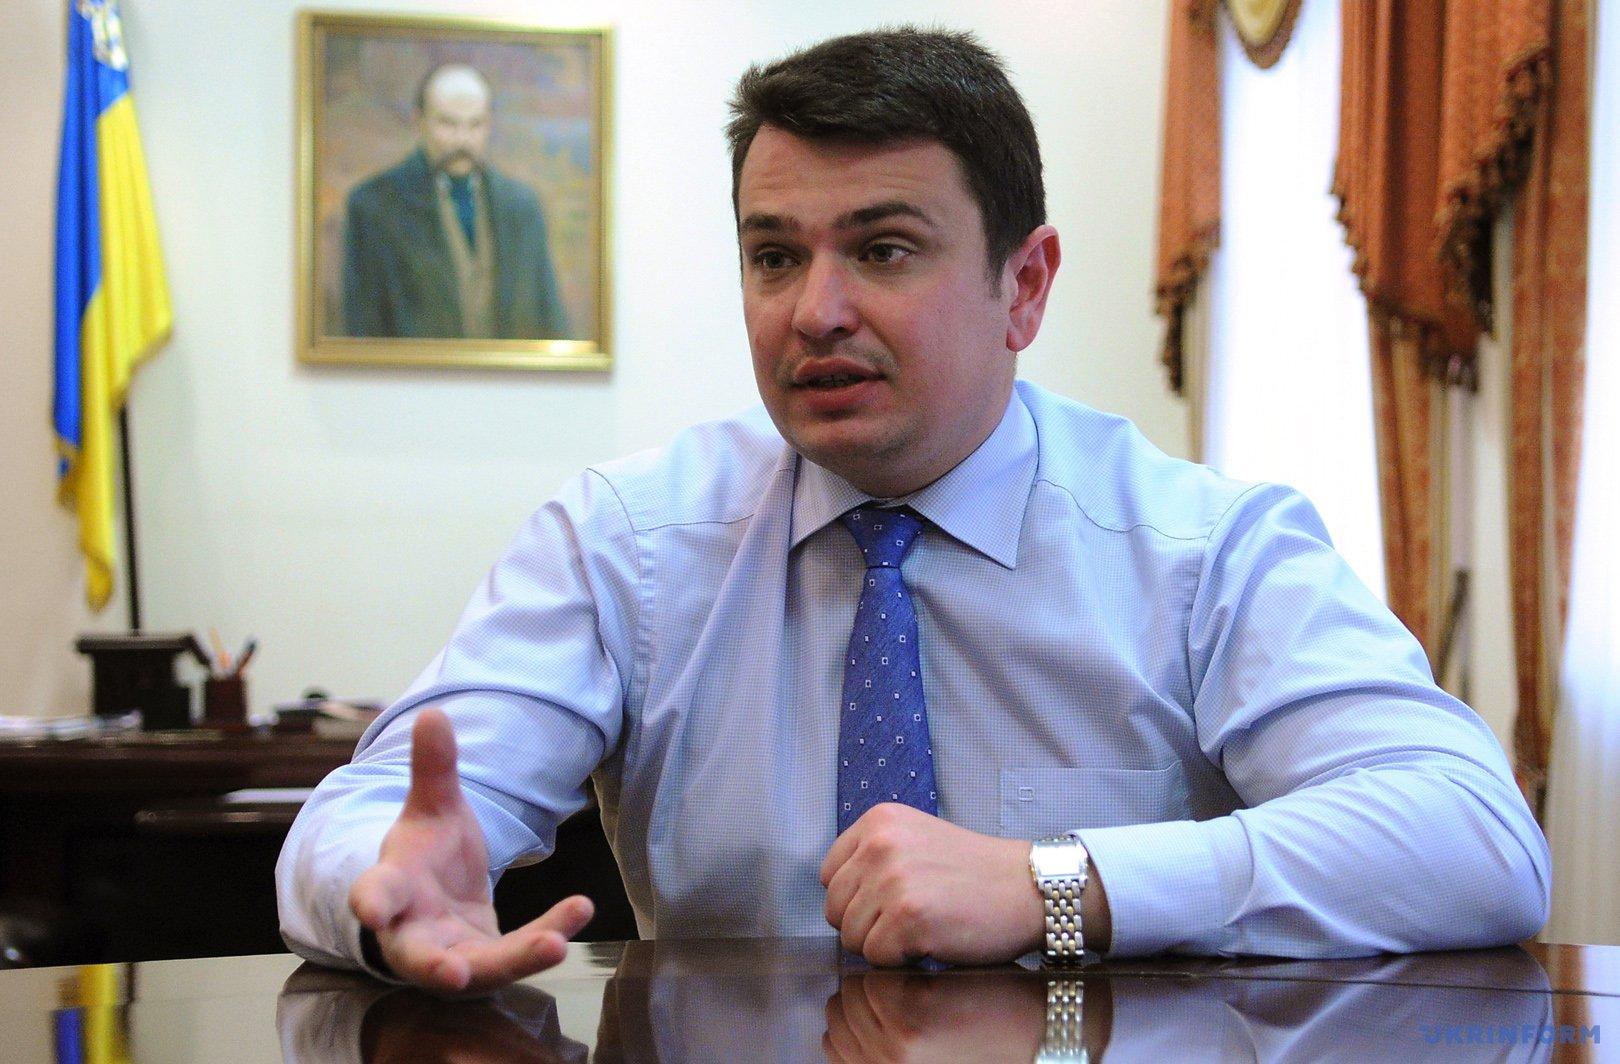 Артем Ситник